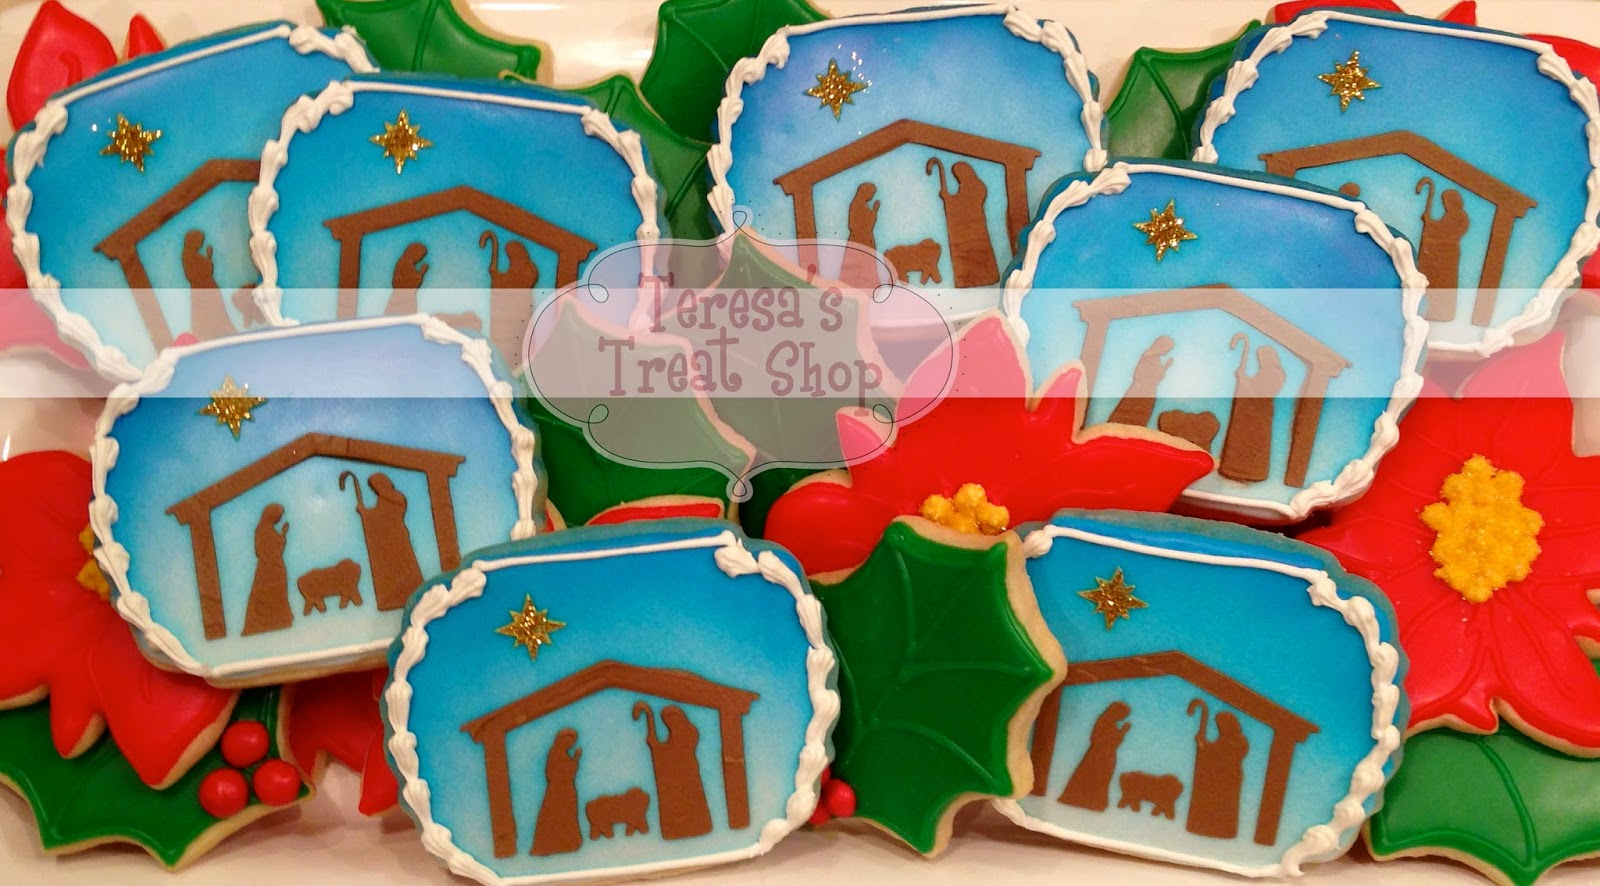 Teresa S Treat Shop Nativity Cookies